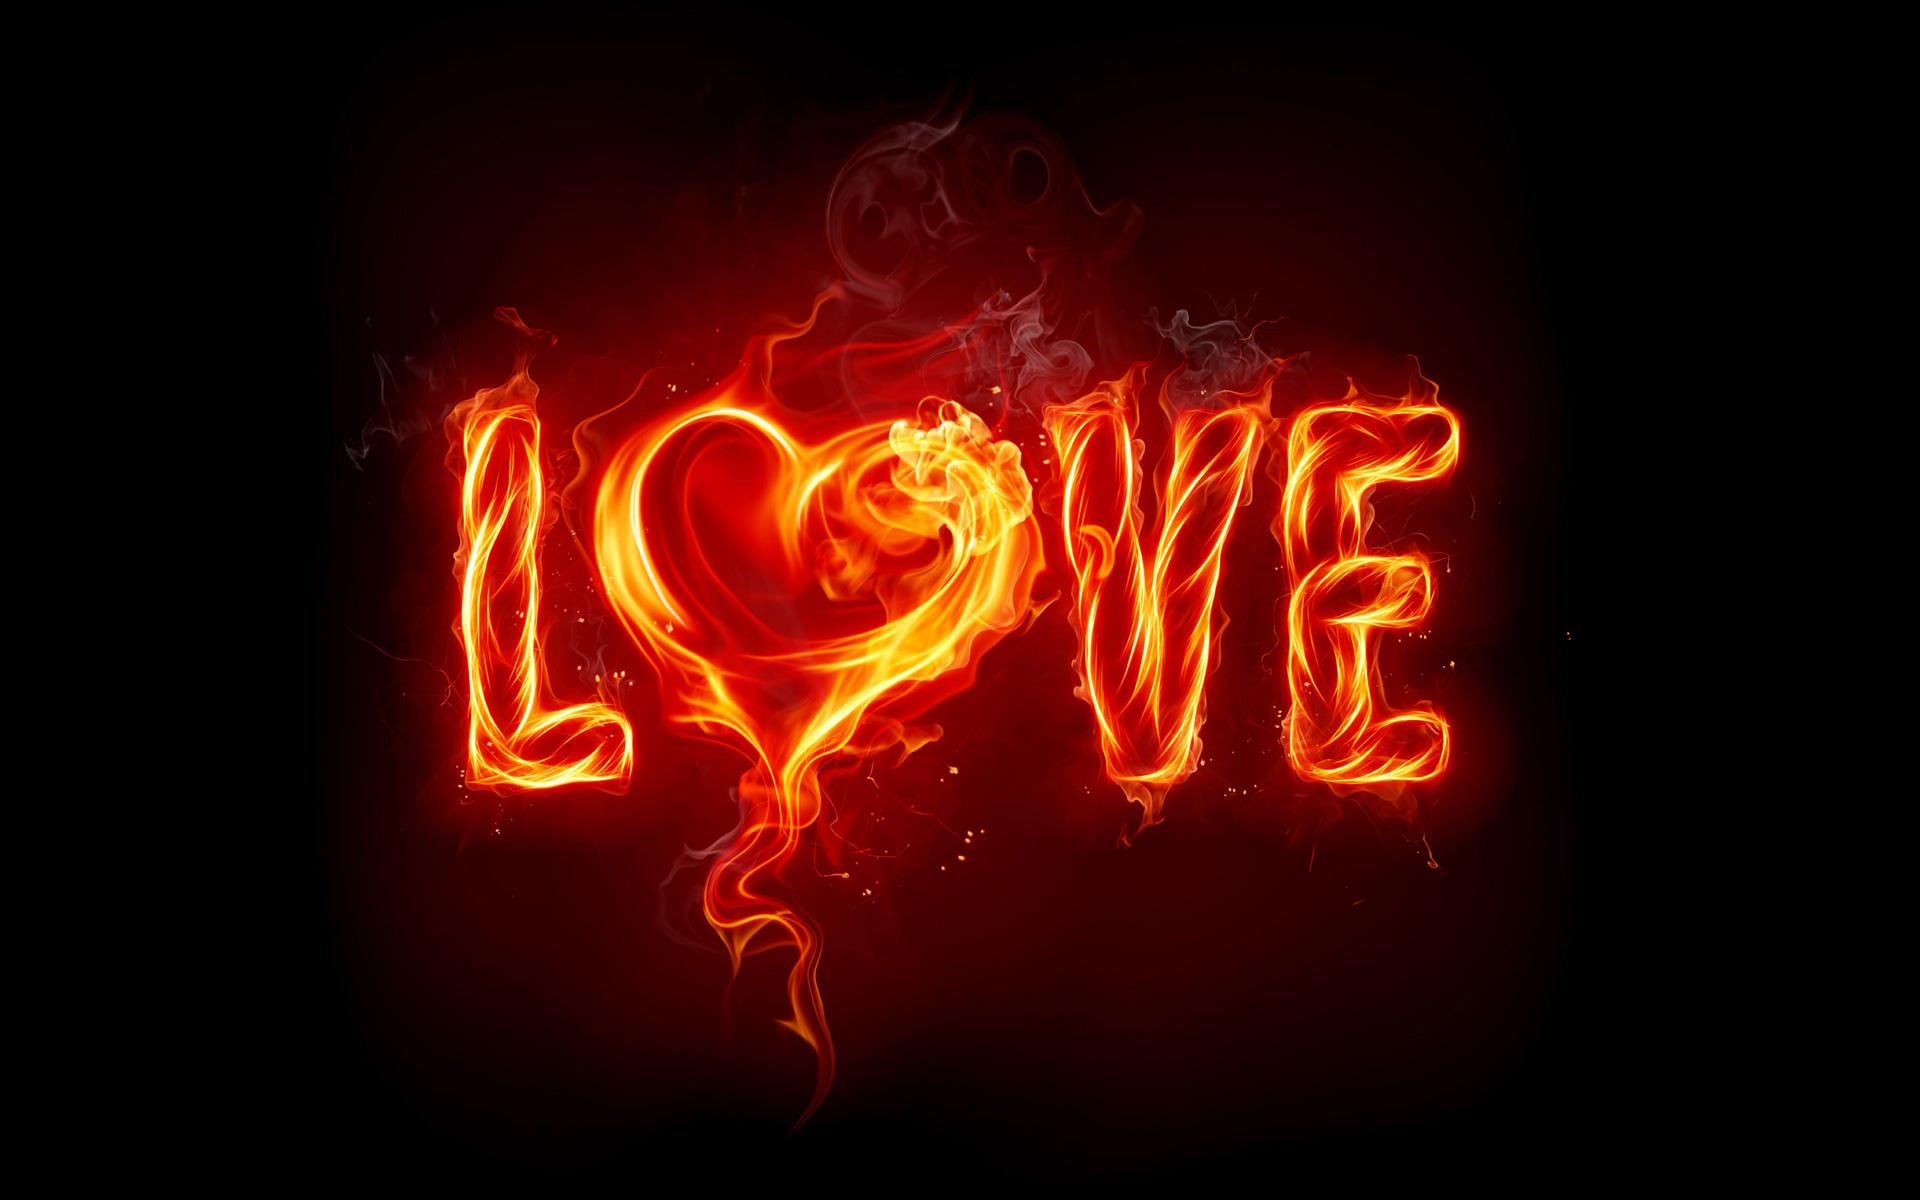 Sally - Burning-love